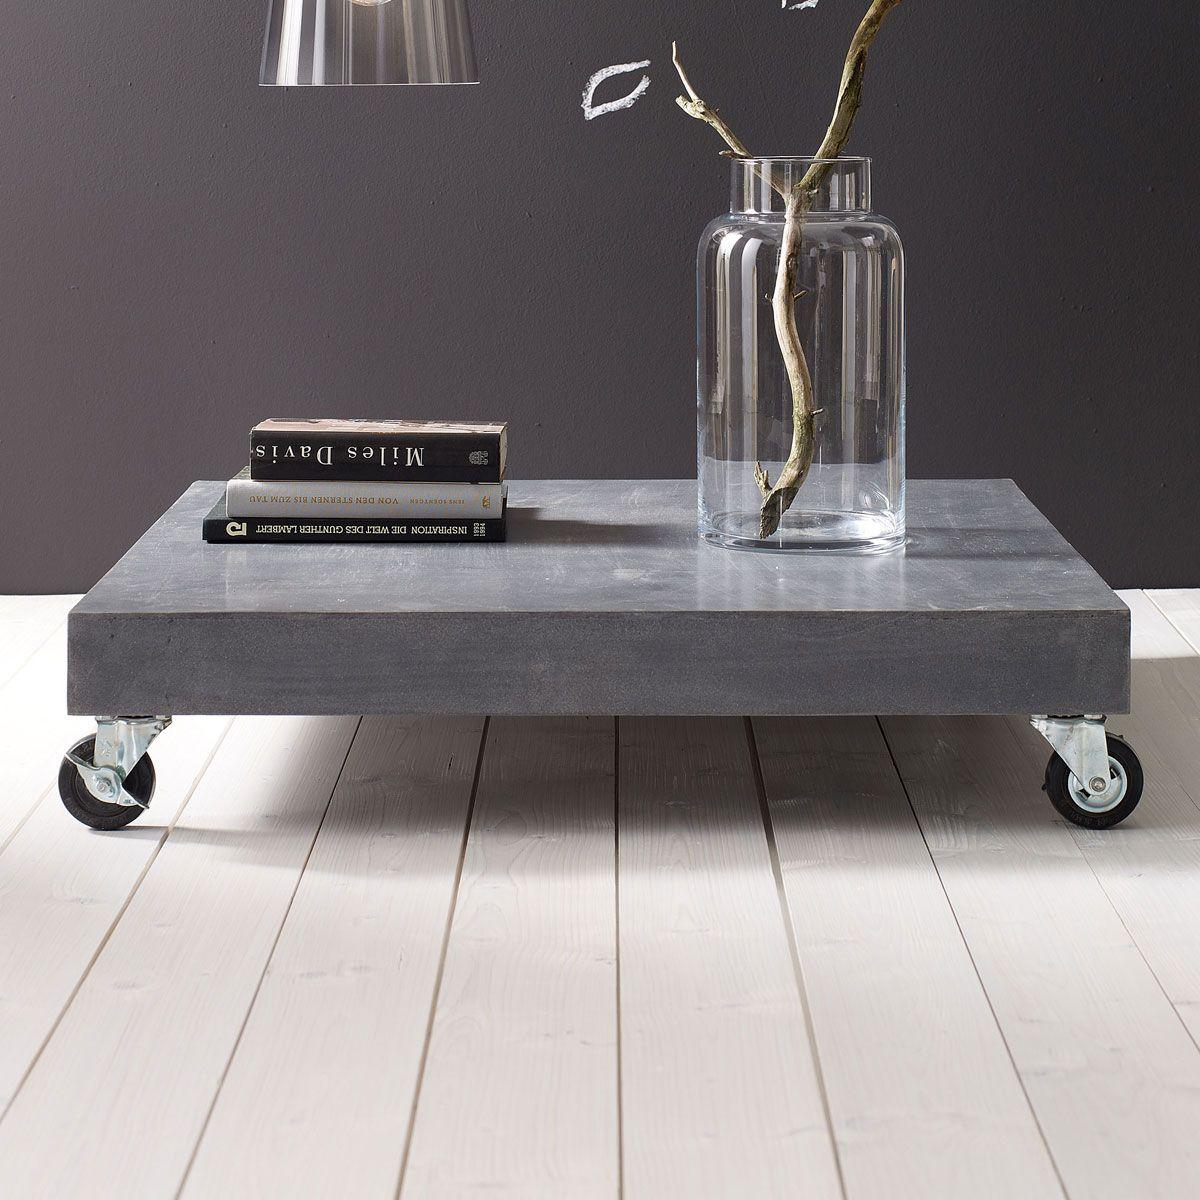 Couchtisch Couchtische Tische Möbel Living Selbermachen Beton Couchtisch Diy Beton Projekte